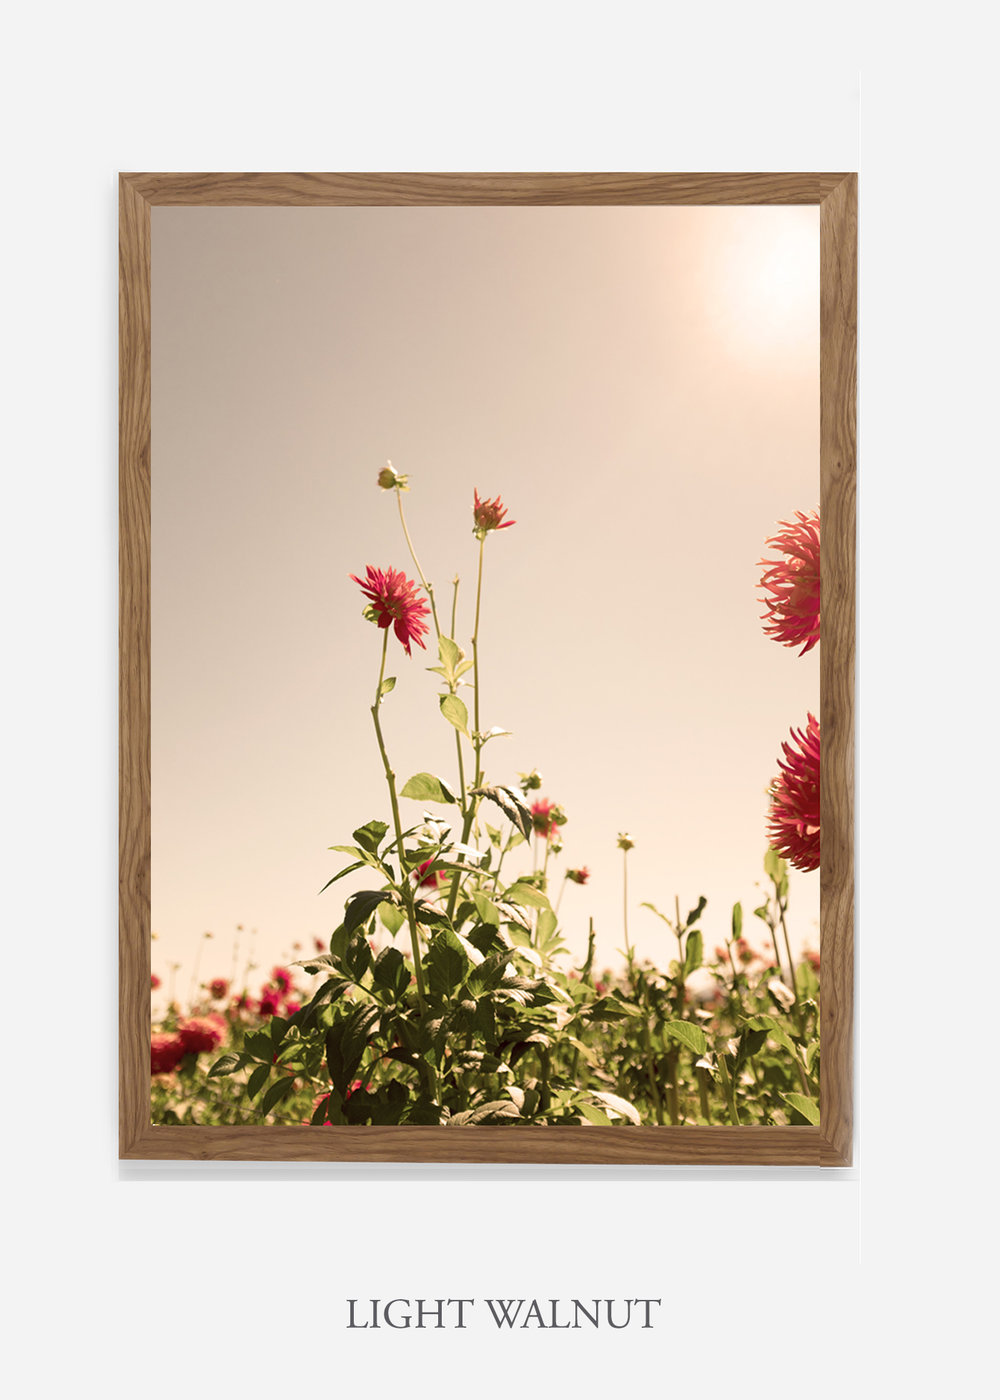 DahliaNo.2_lightwalnutframe__No.1_interiordesign_botanicalprint_art.jpg